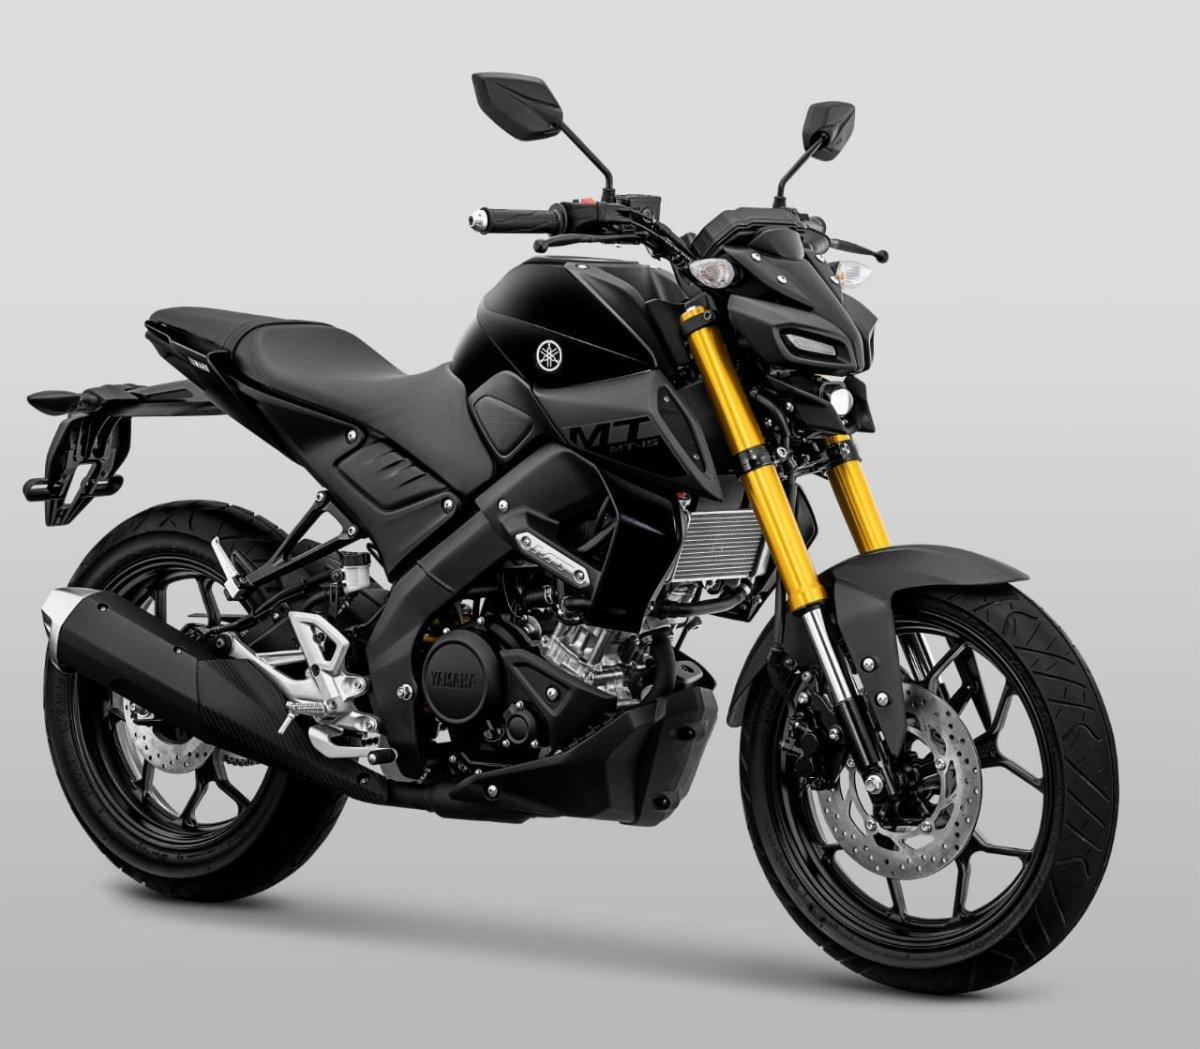 Yamaha Resmi Rislis MT-15 untuk Pasar Indonesia, Flagship Kelas Sport Naked 150 cc